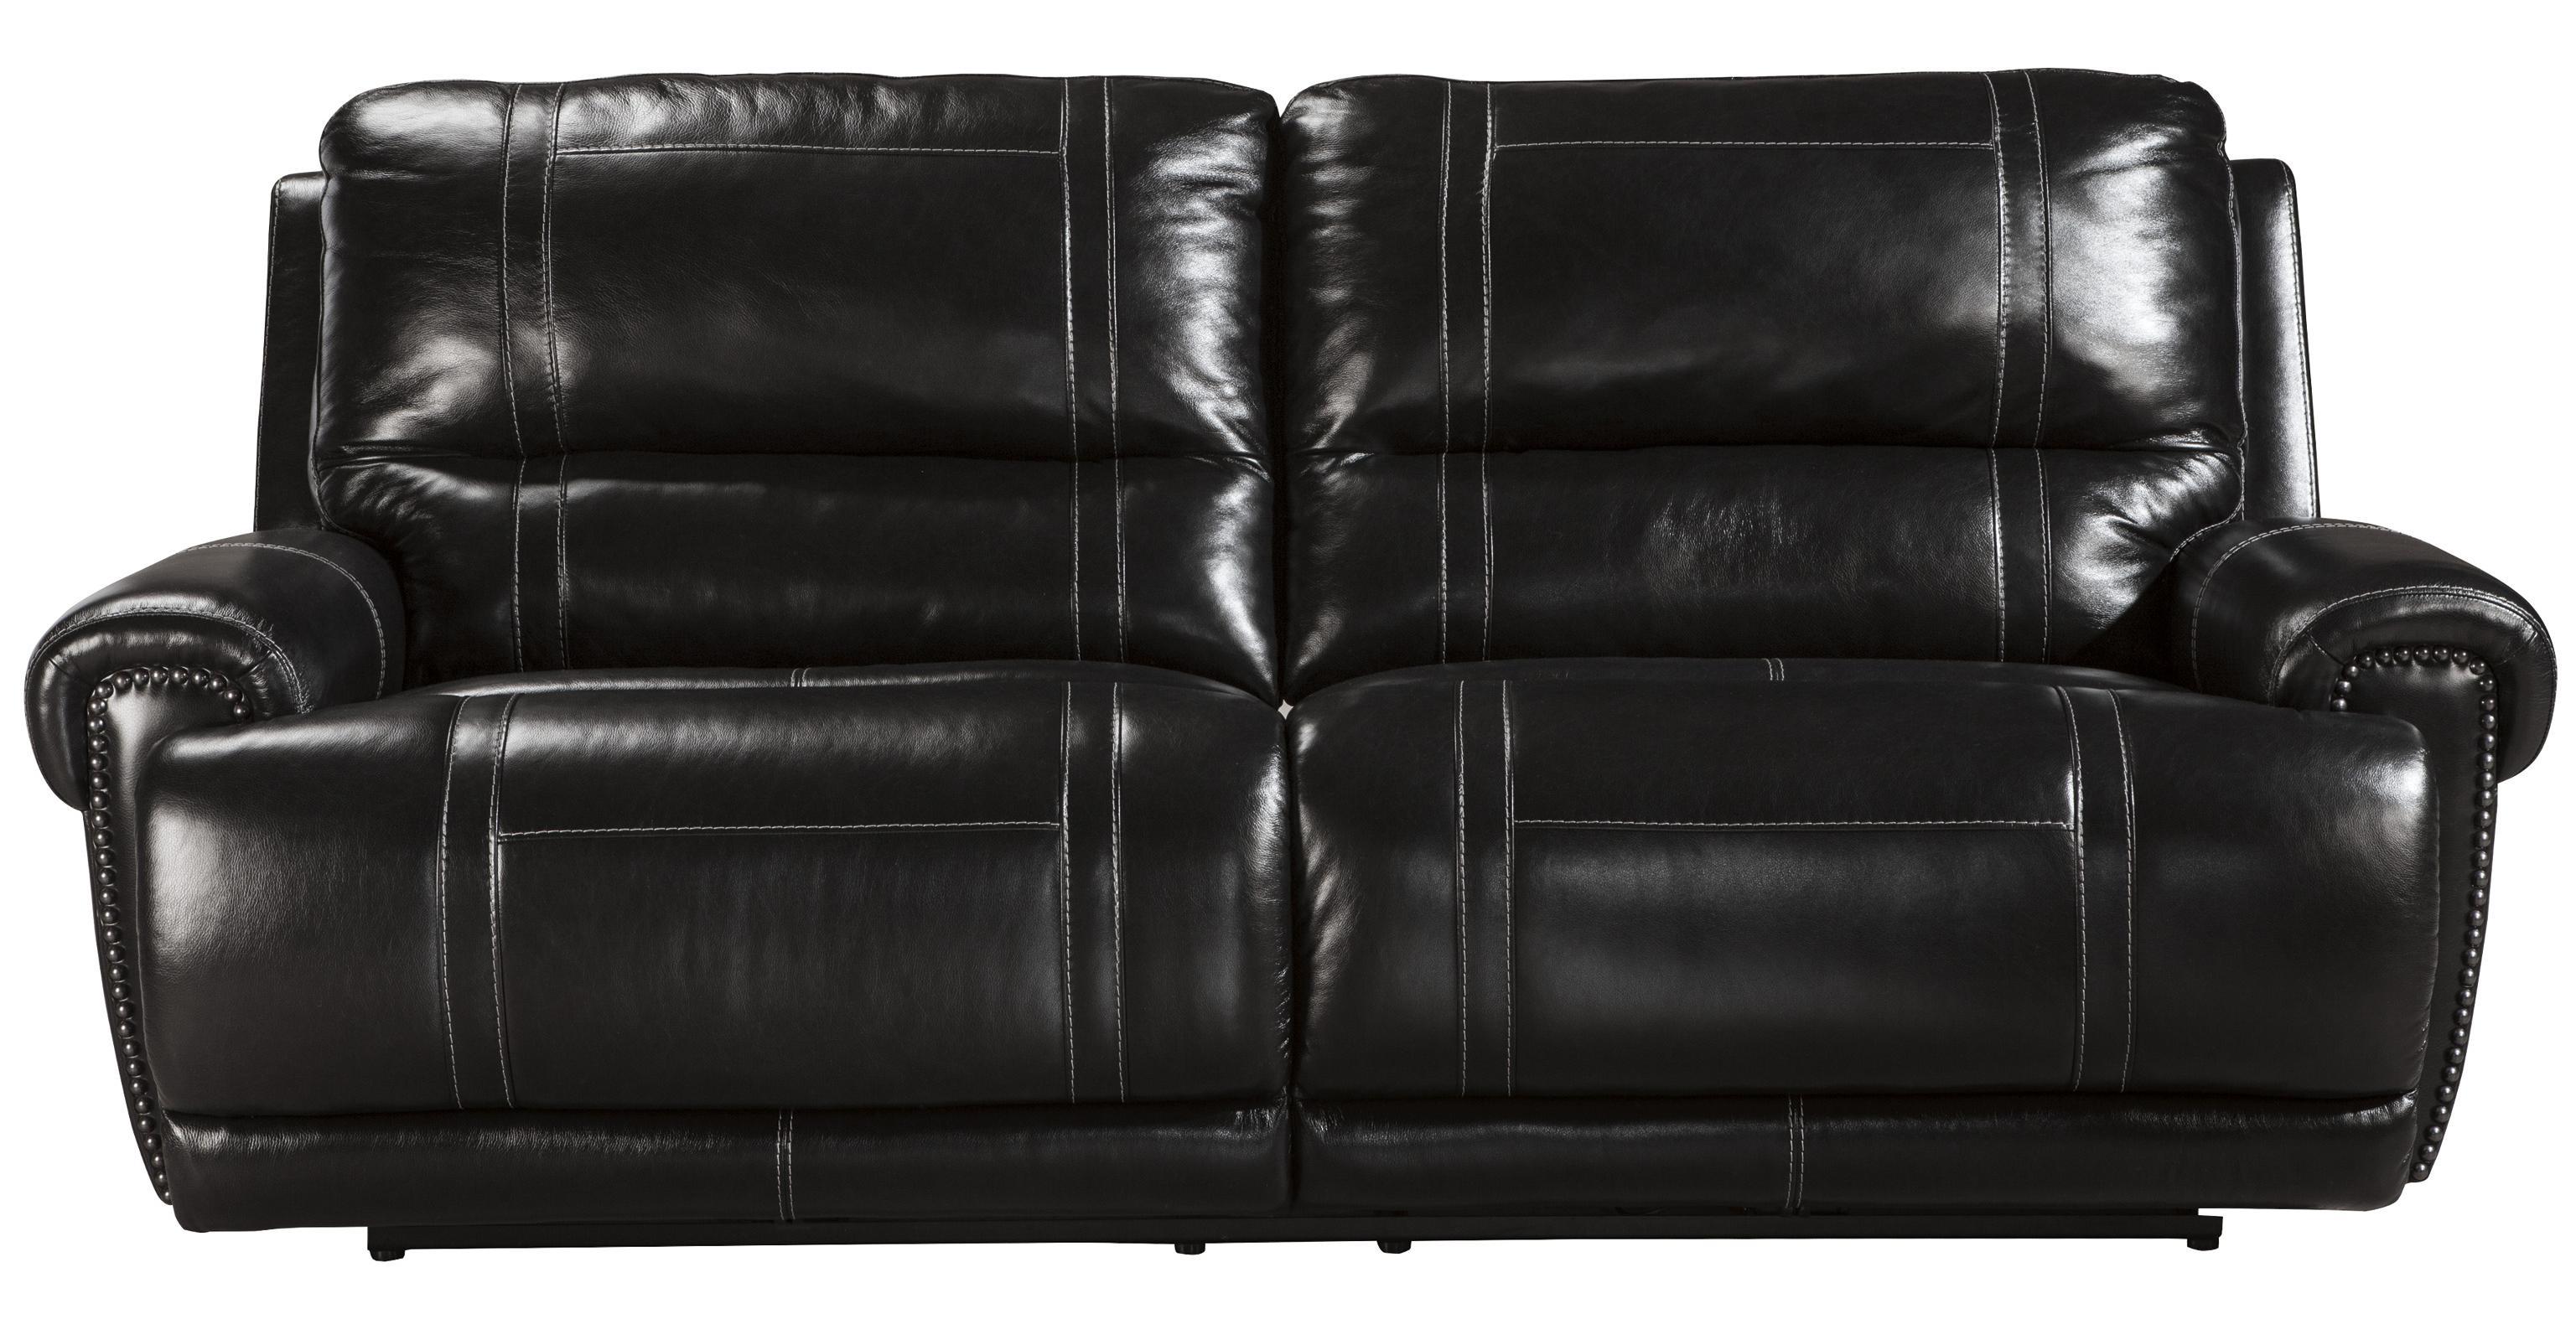 Signature Design by Ashley Paron - Antique 2 Seat Reclining Power Sofa - Item Number: U7590147